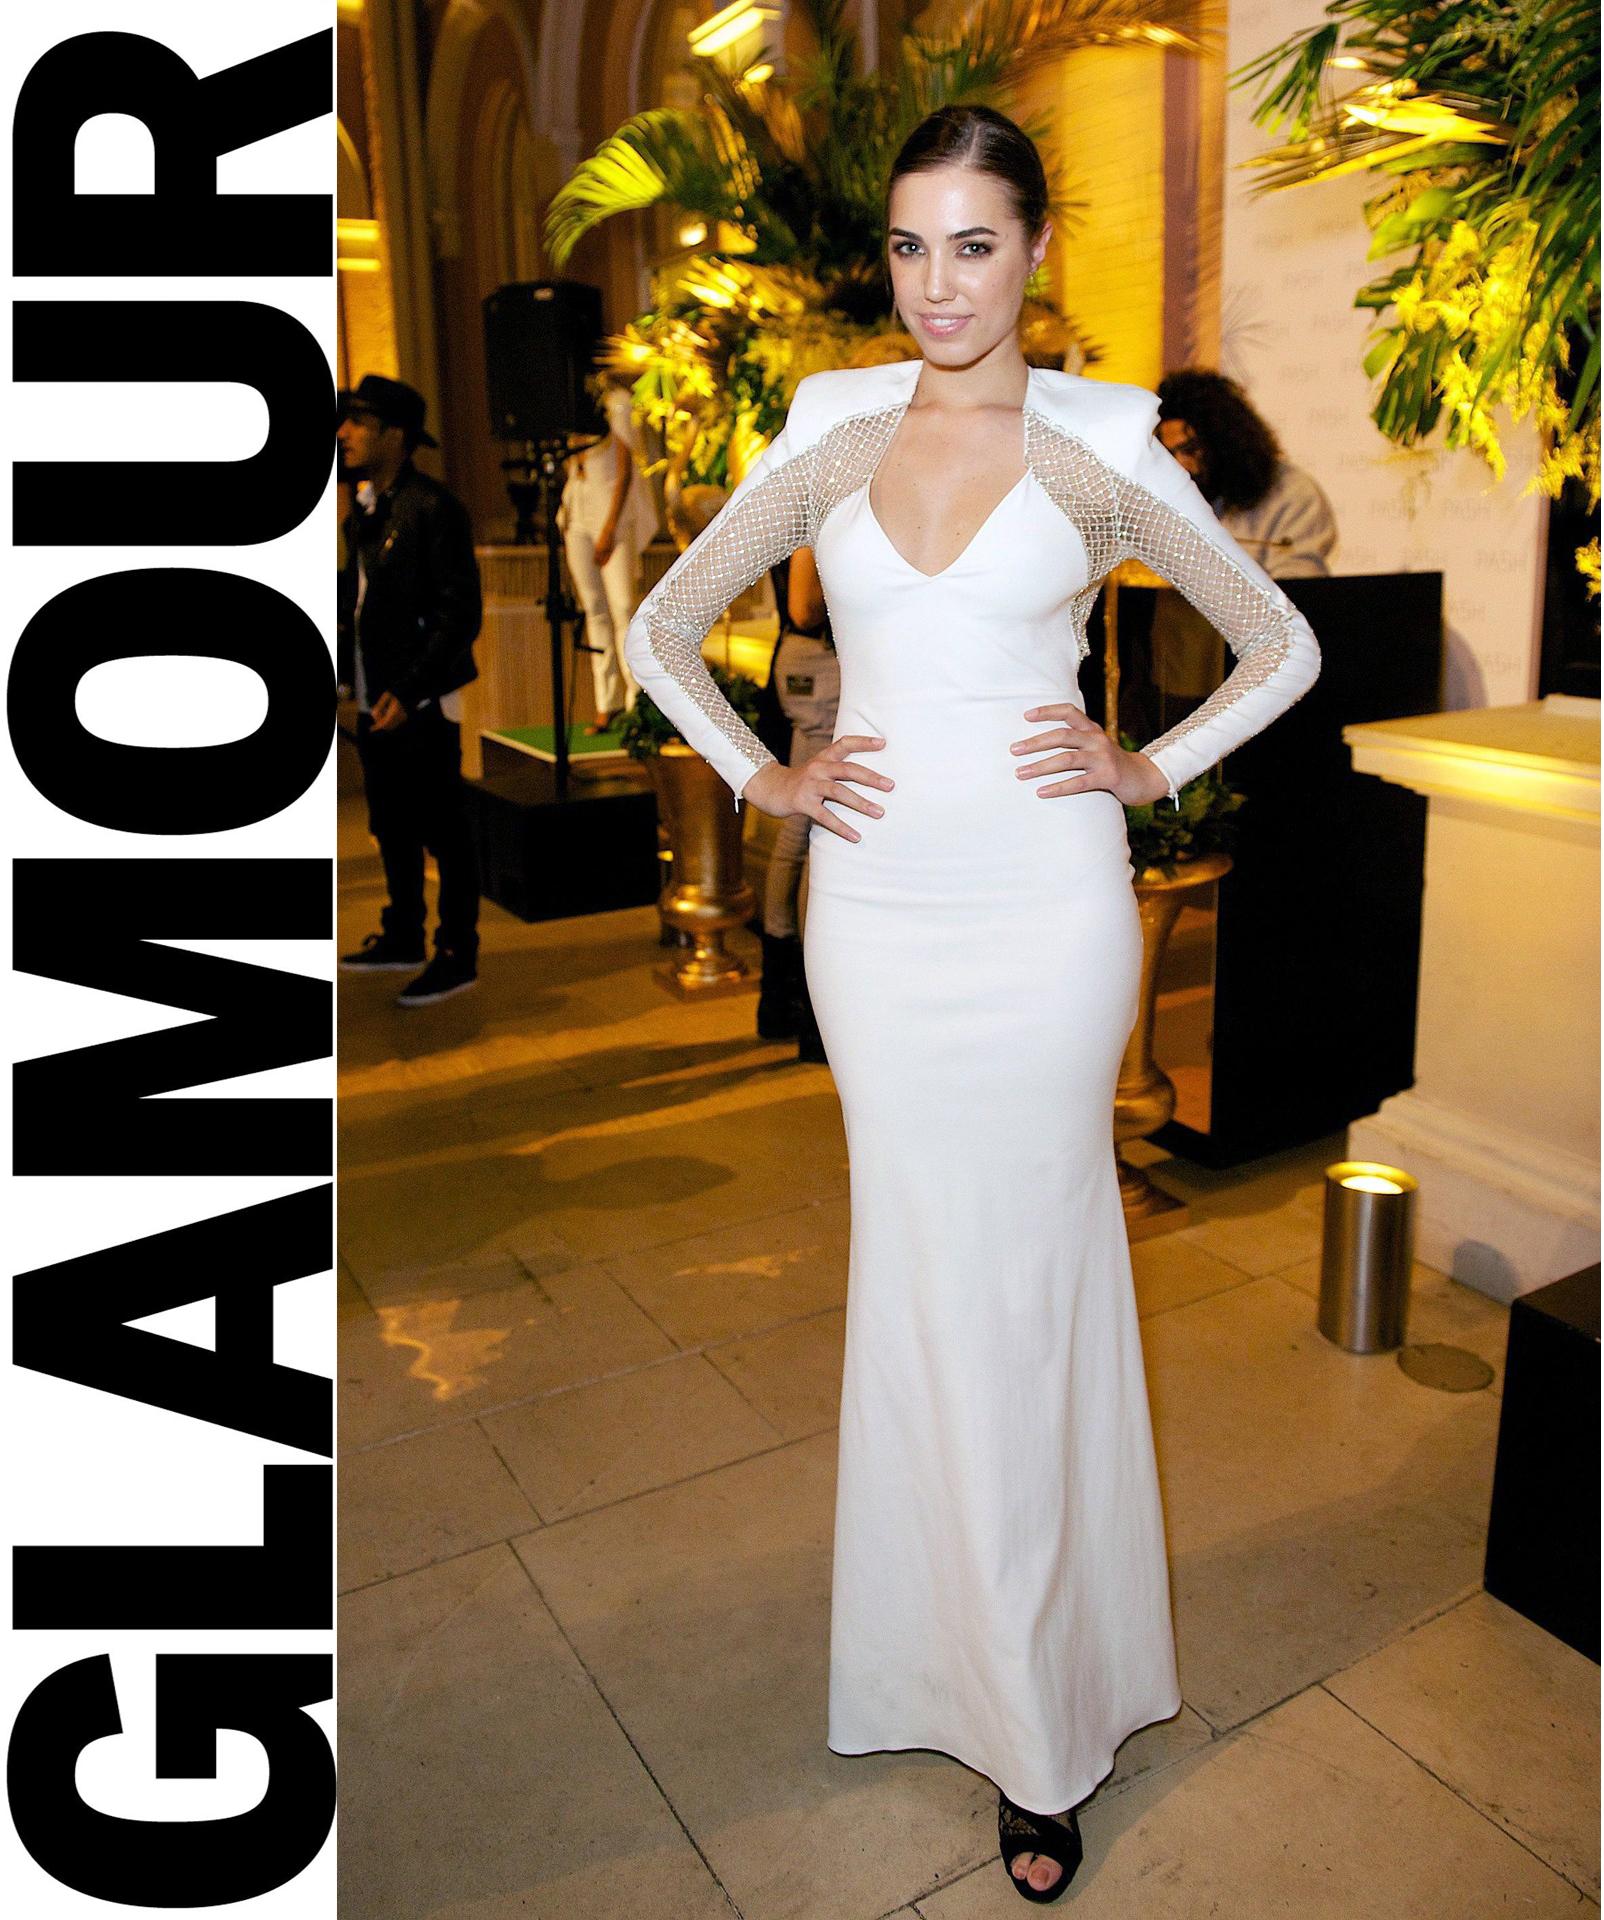 GLAMOUR.CO.UK    Amber Le Bon Best Dressed Of The Week On Glamour.Co.Uk